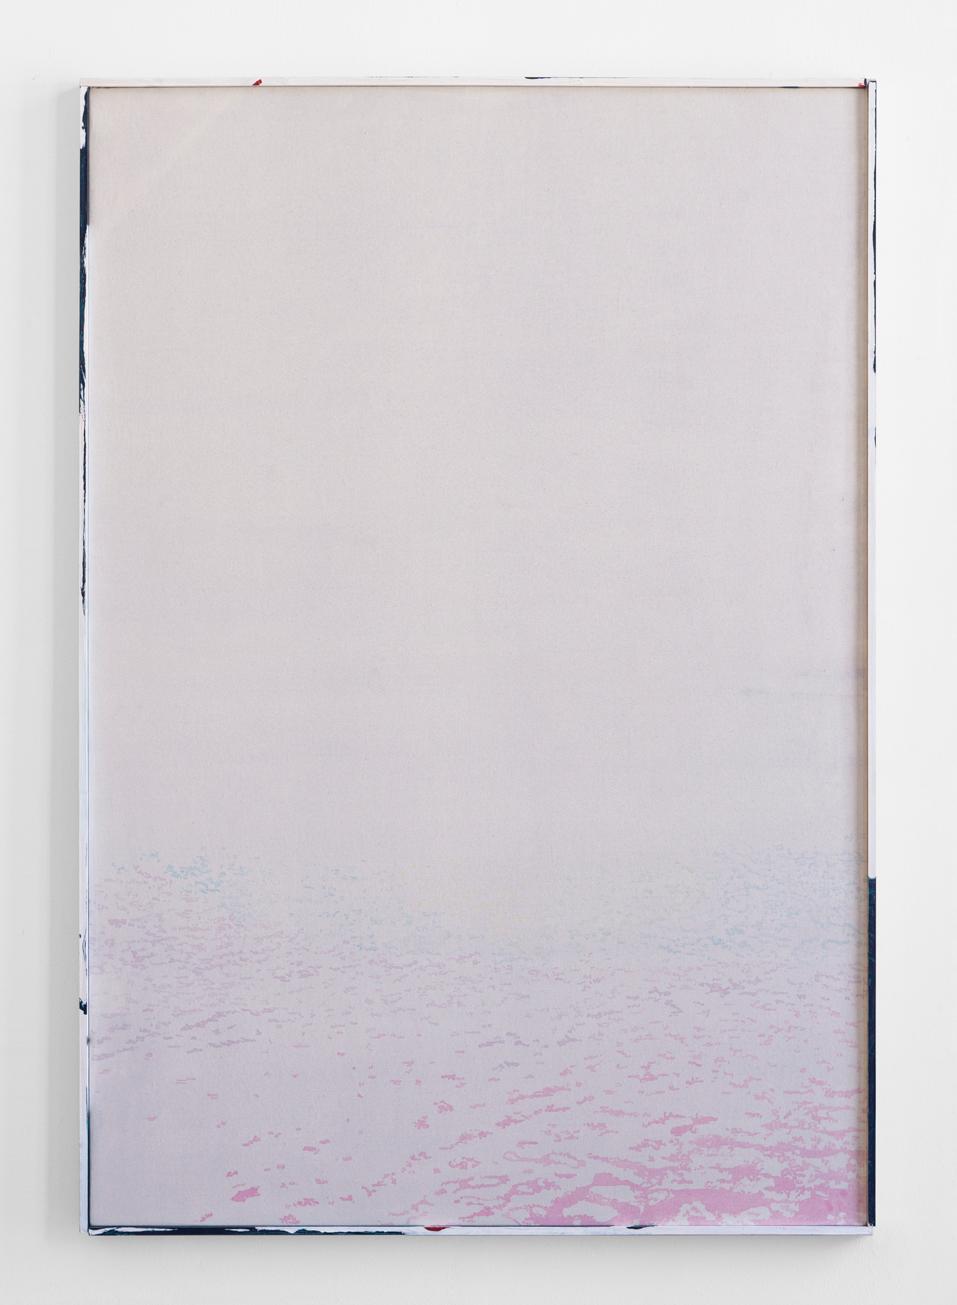 Francesco João, Untitled, 2019. Courtesy the artist and Mendes Wood DM.